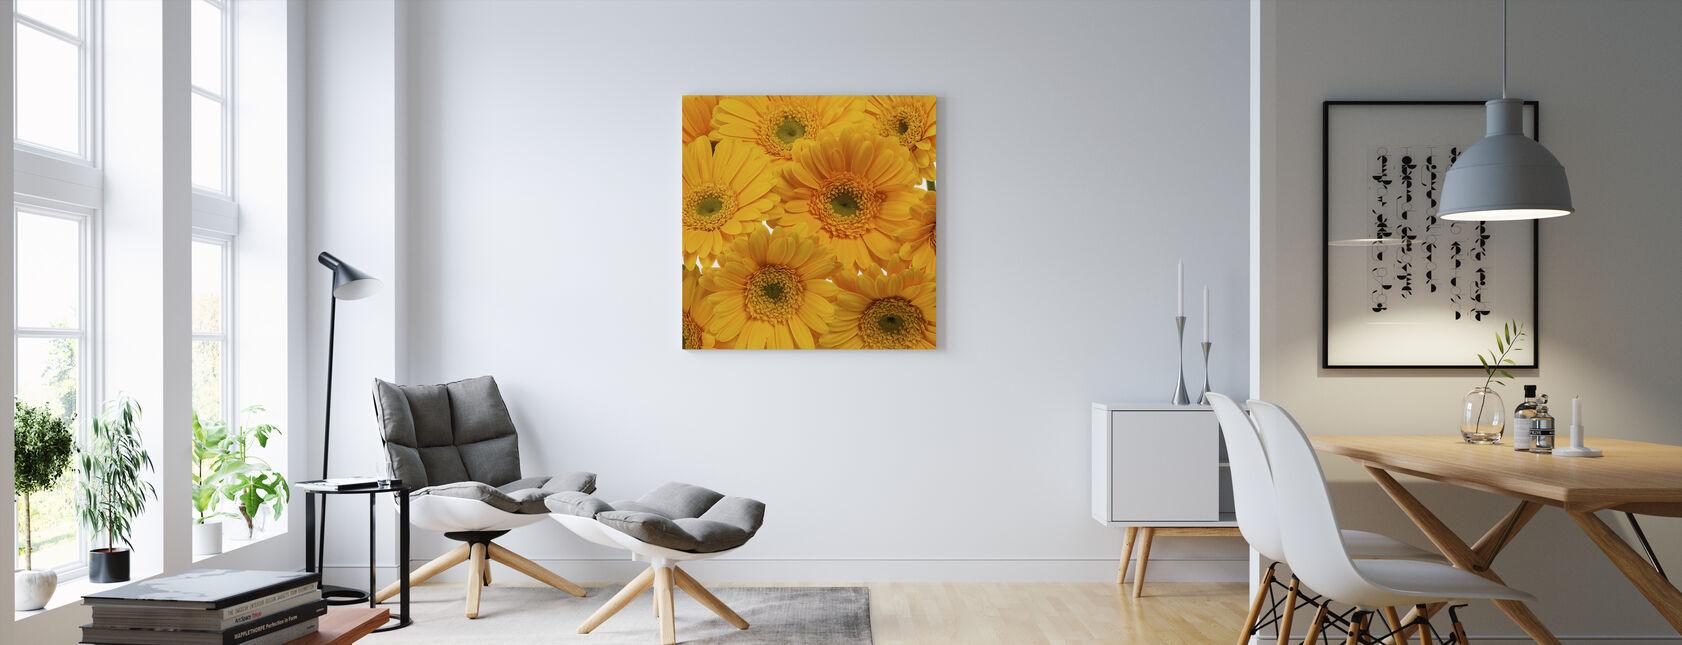 Yellow Gerbera Close Up - Canvas print - Living Room